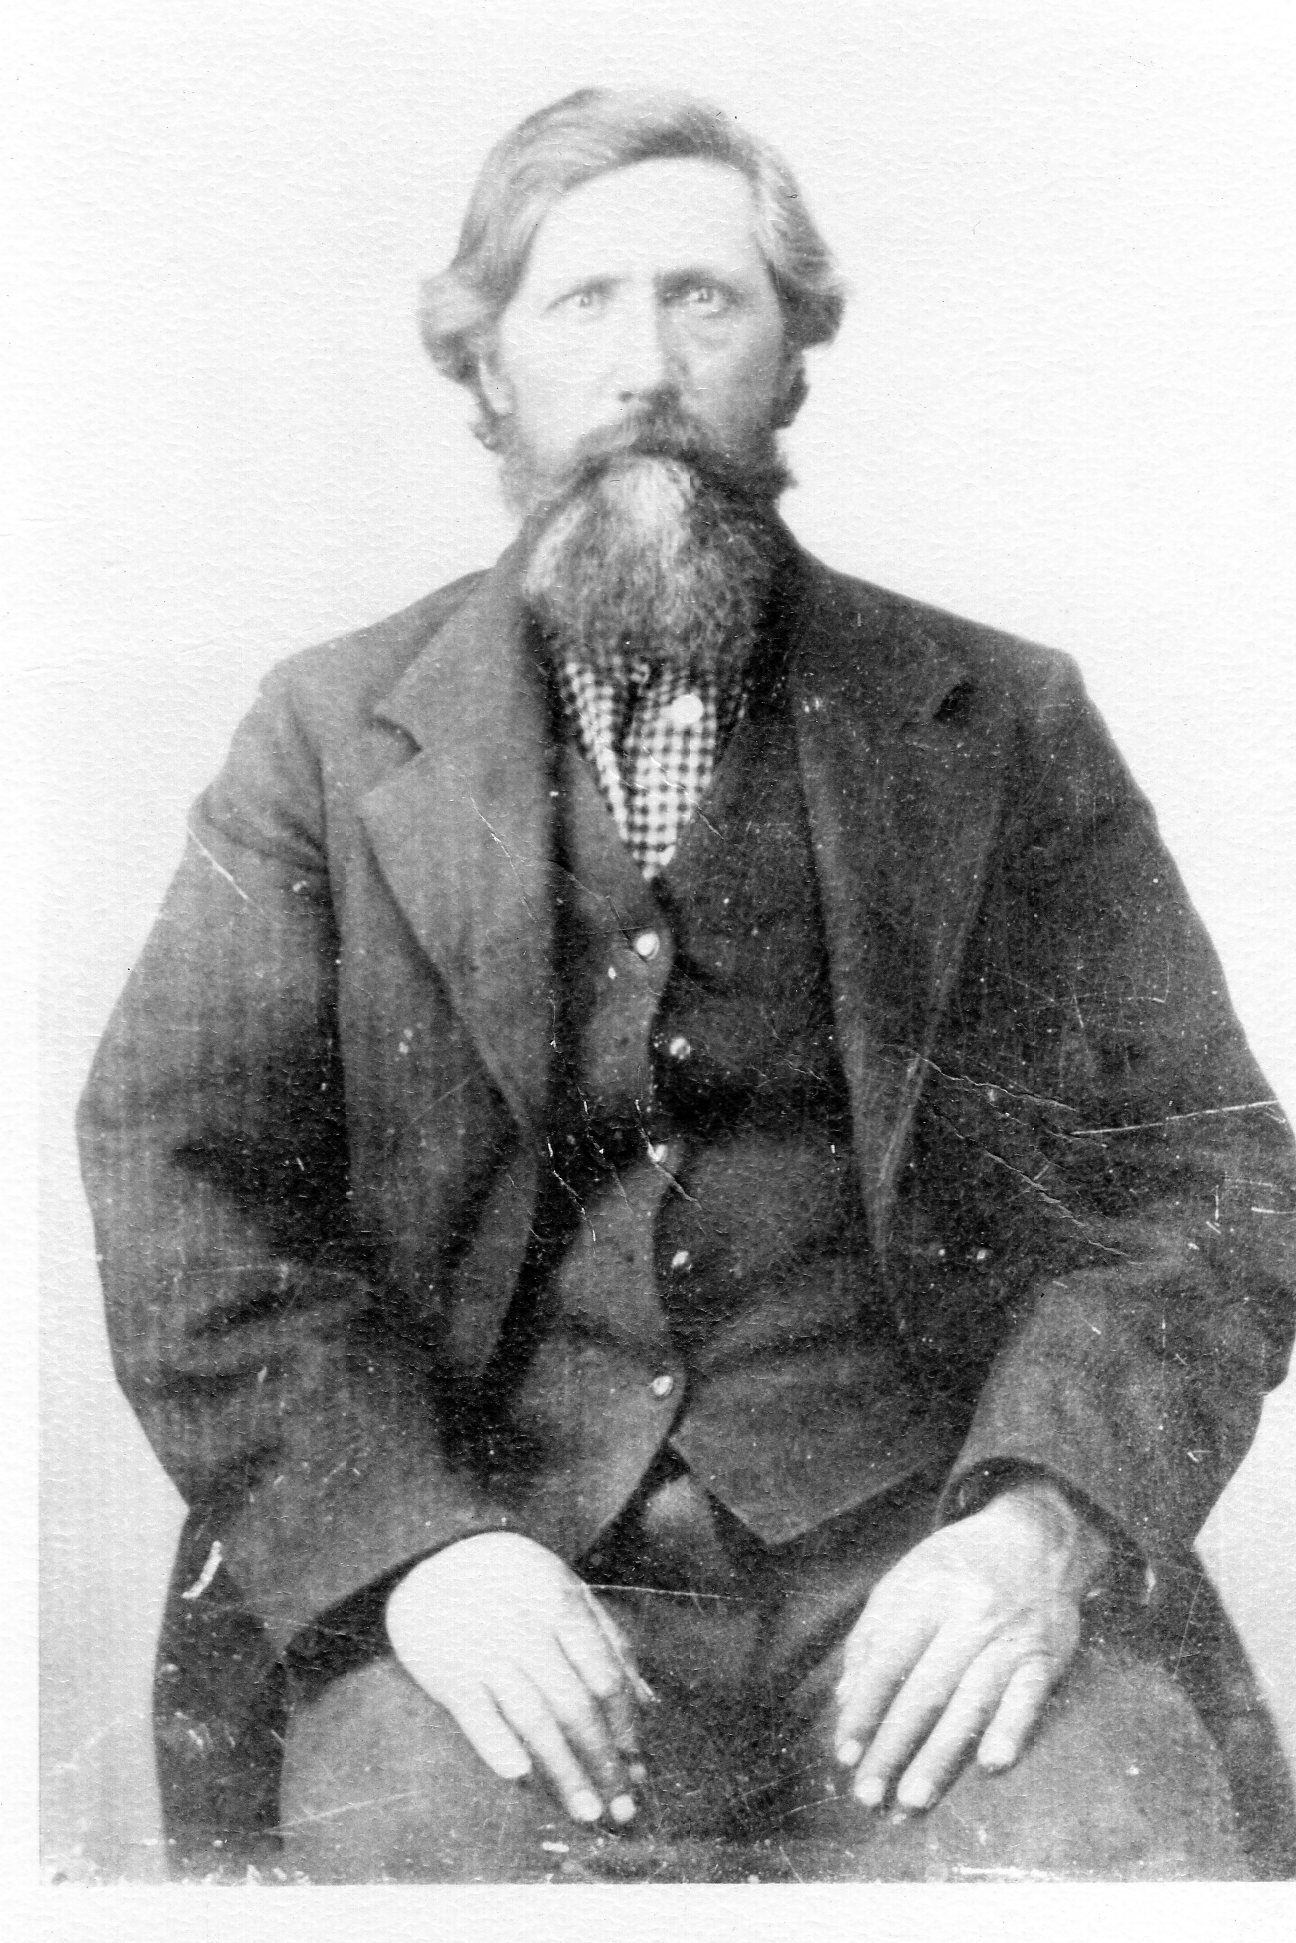 Gilbert Valentine Hudson